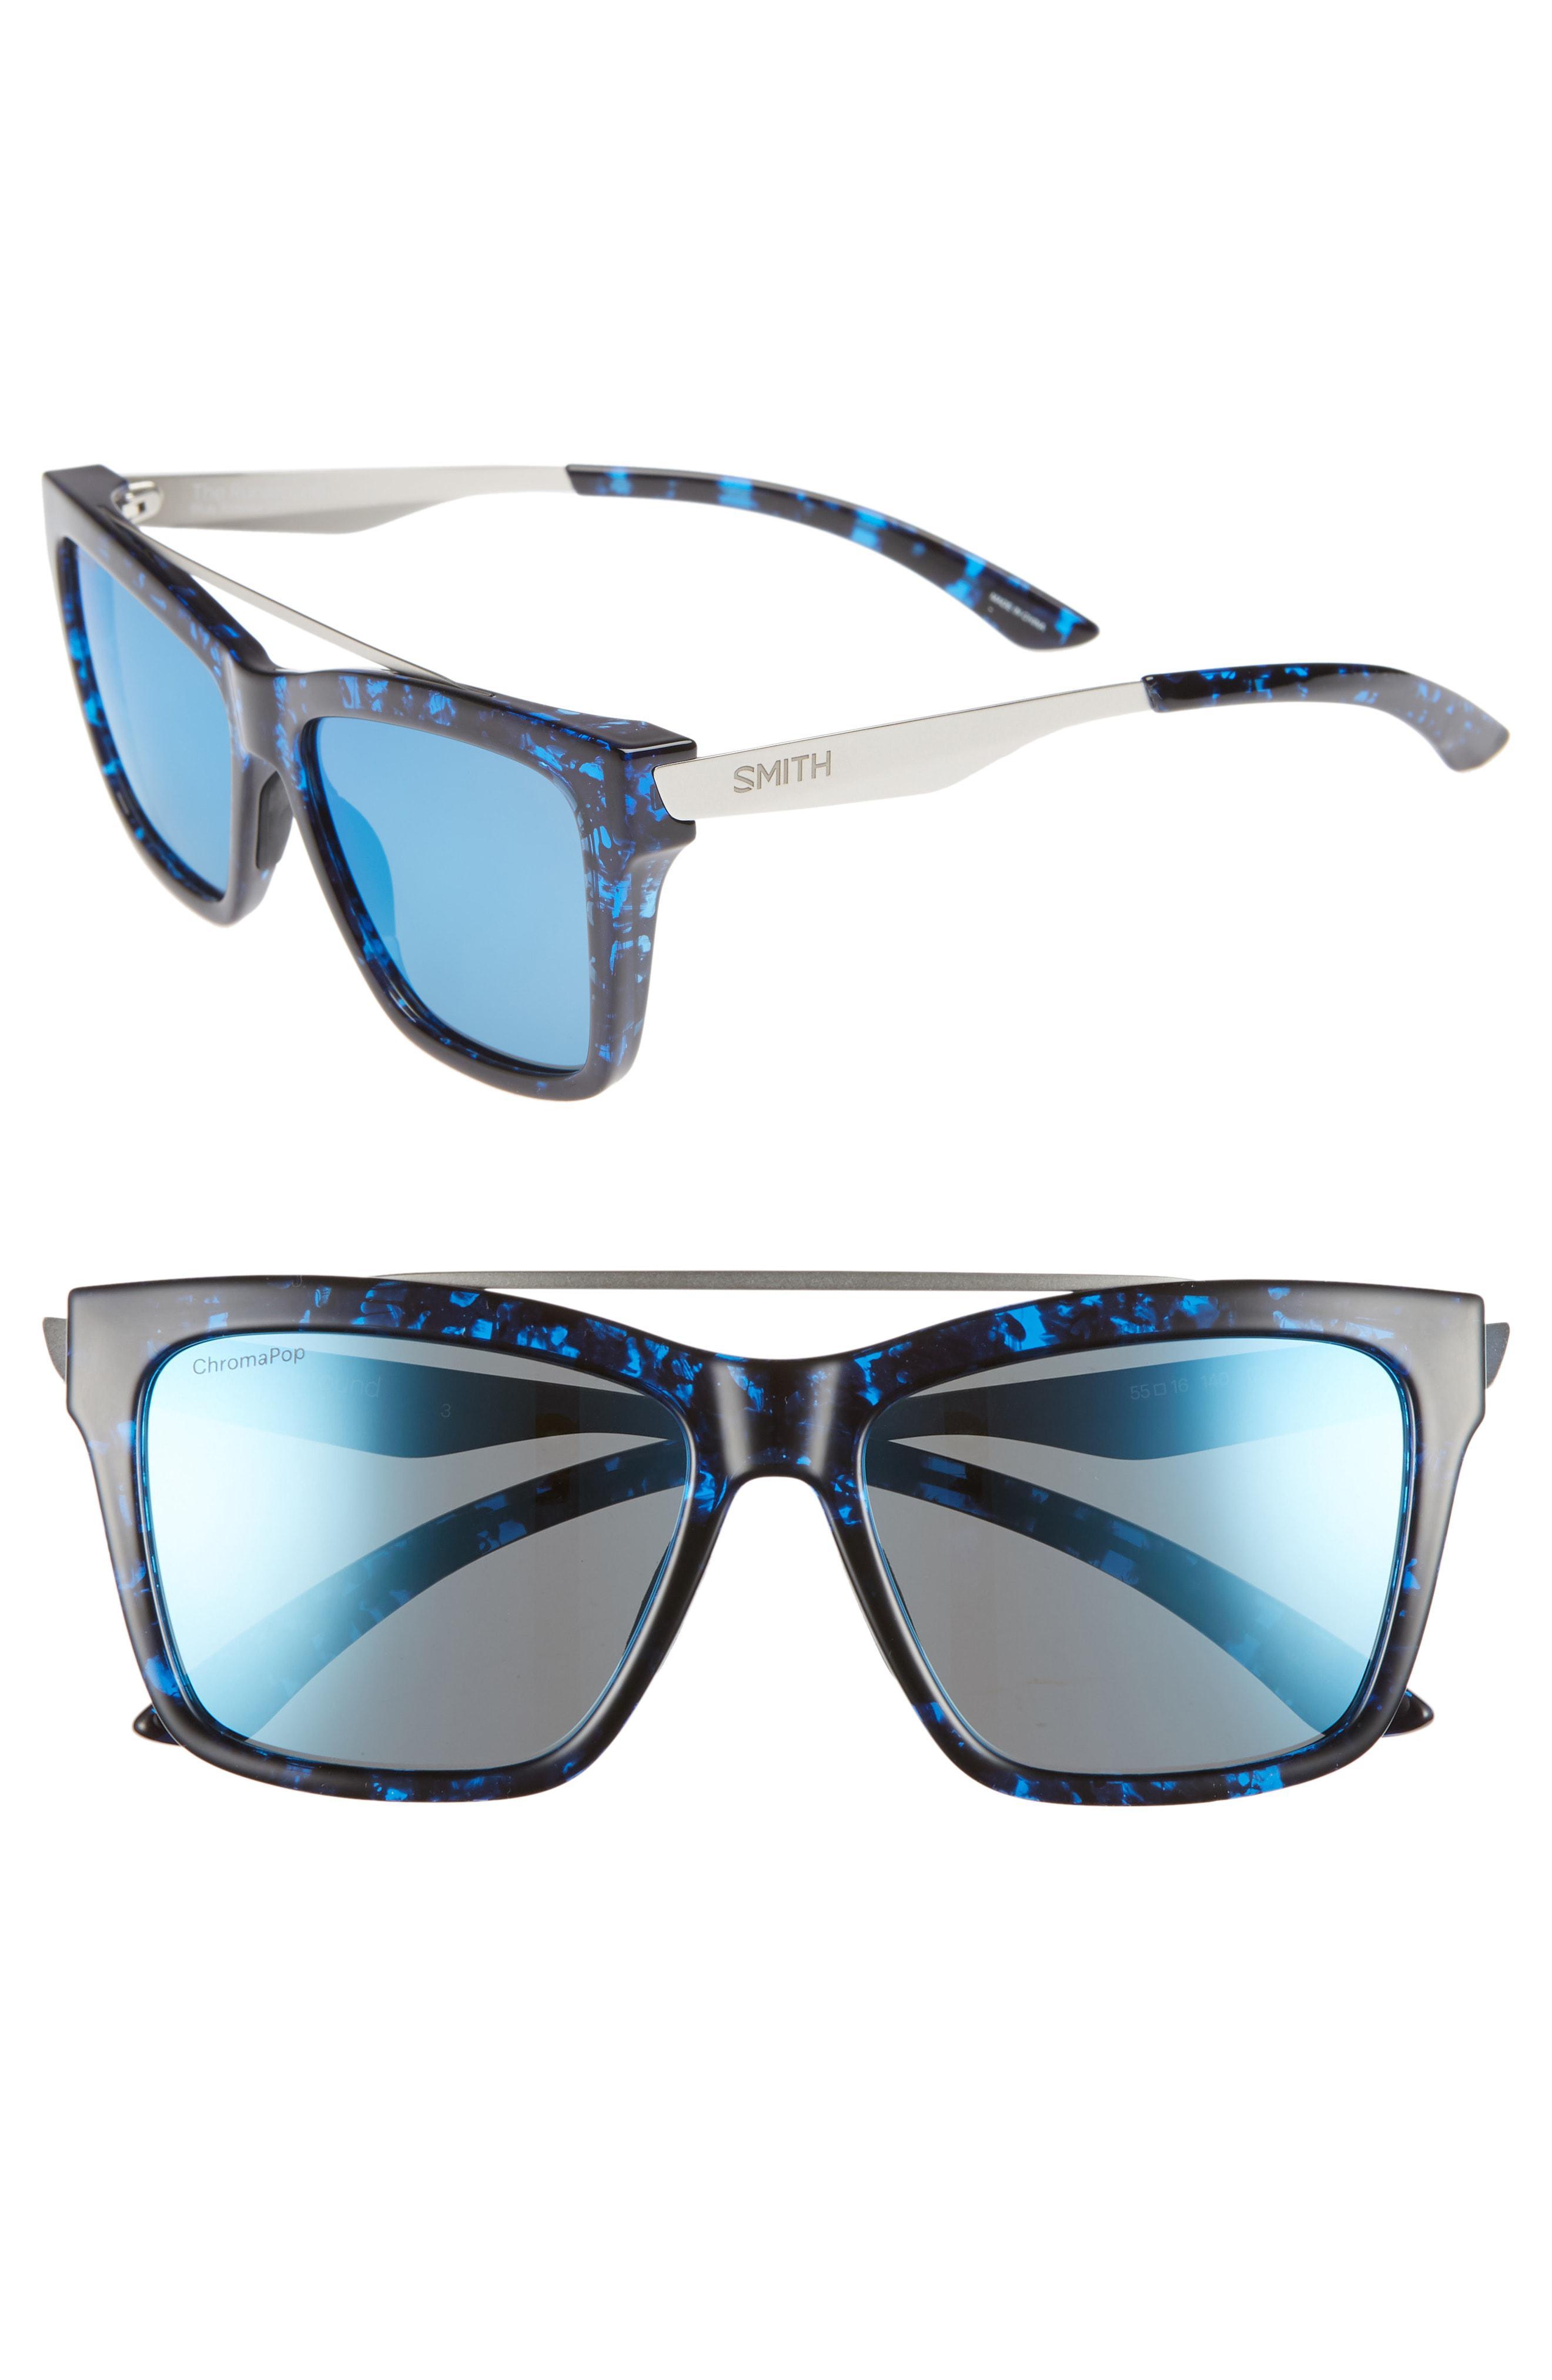 24bc432608 Smith - Blue The Runaround 55mm Chromapop(tm) Polarized Sunglasses - -  Lyst. View fullscreen